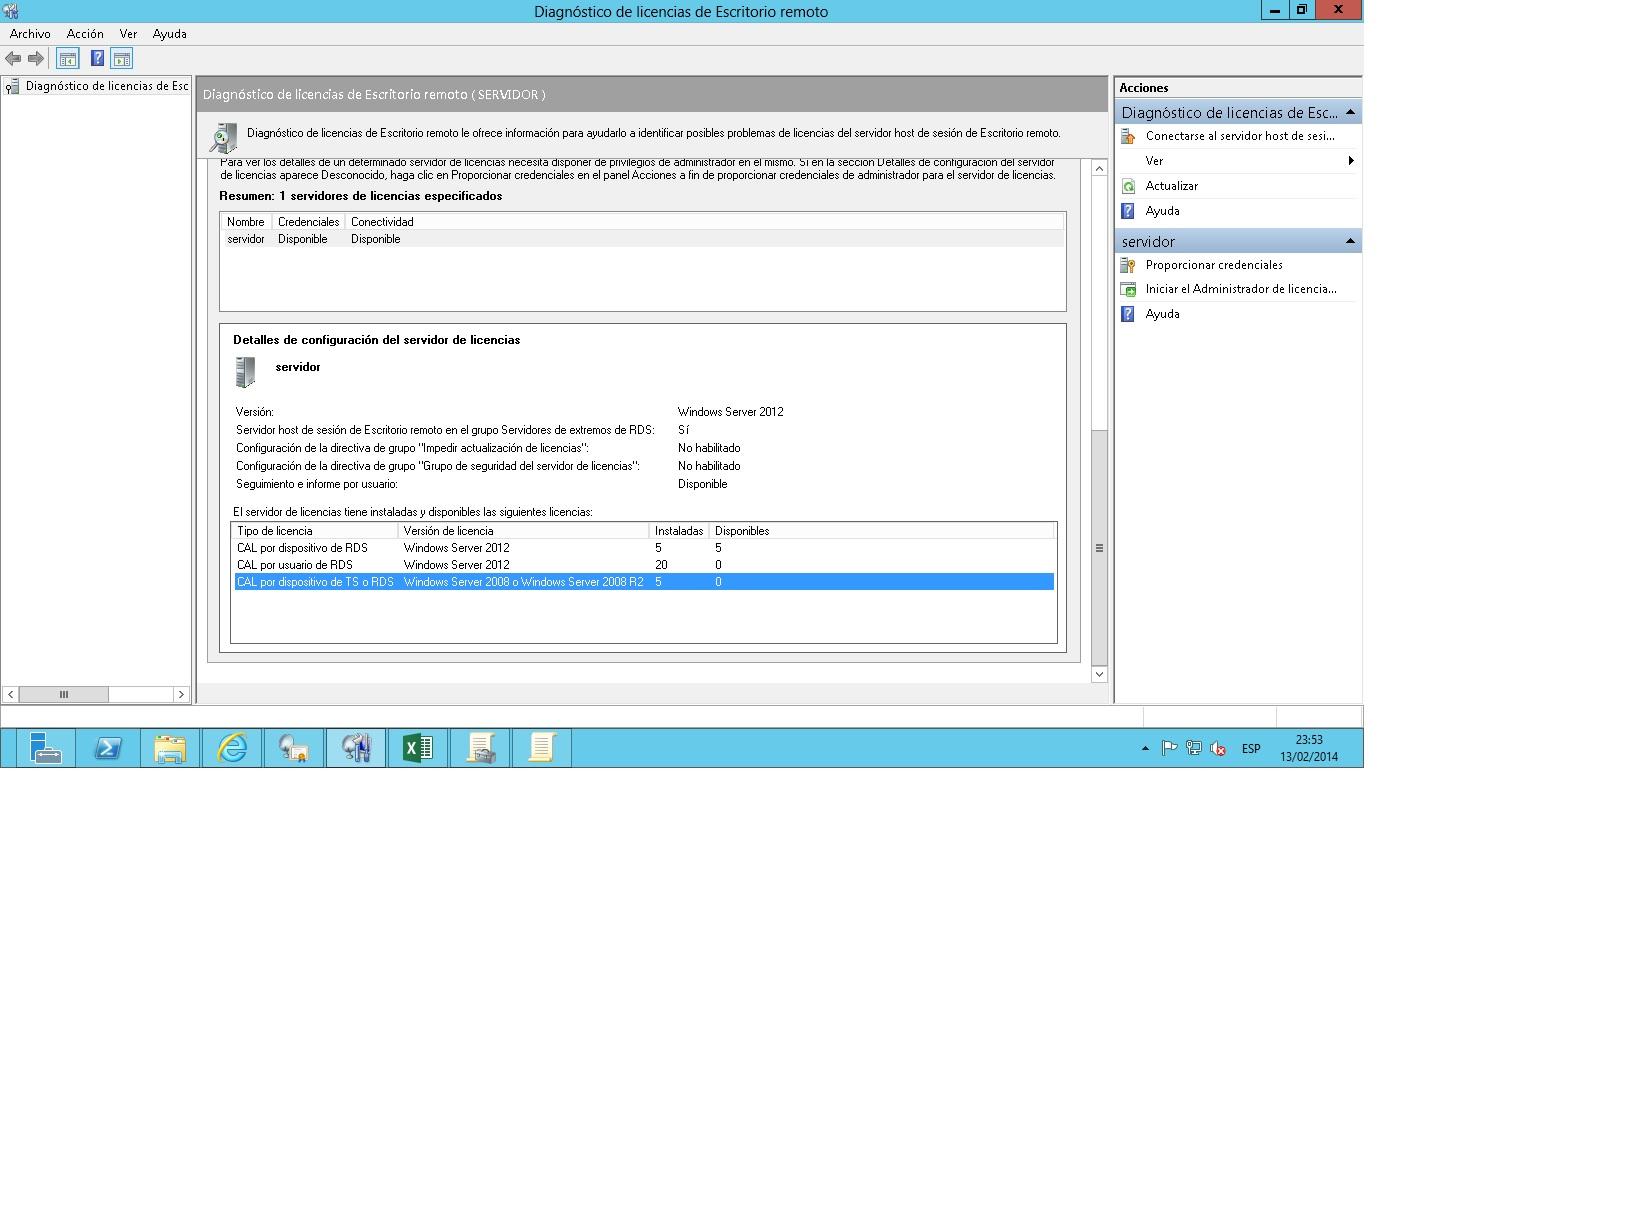 Modo De Licencia Rd No Configurado En Windows Server 2012